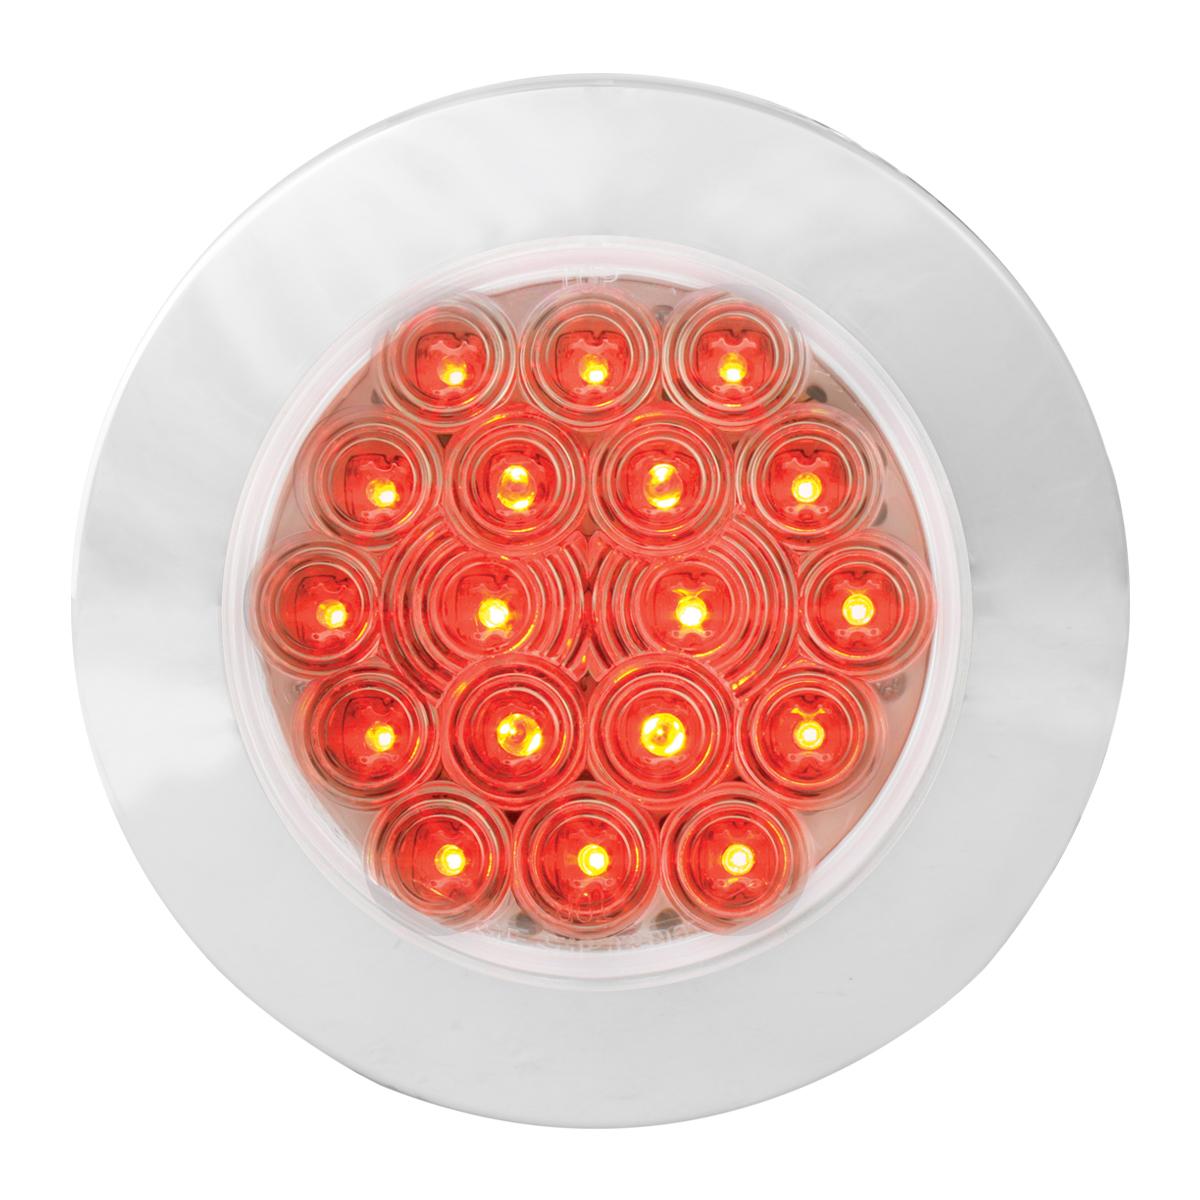 "75903 Red/Clear 4"" Fleet Flange Mount LED Light with Chrome Twist & Lock Bezel"